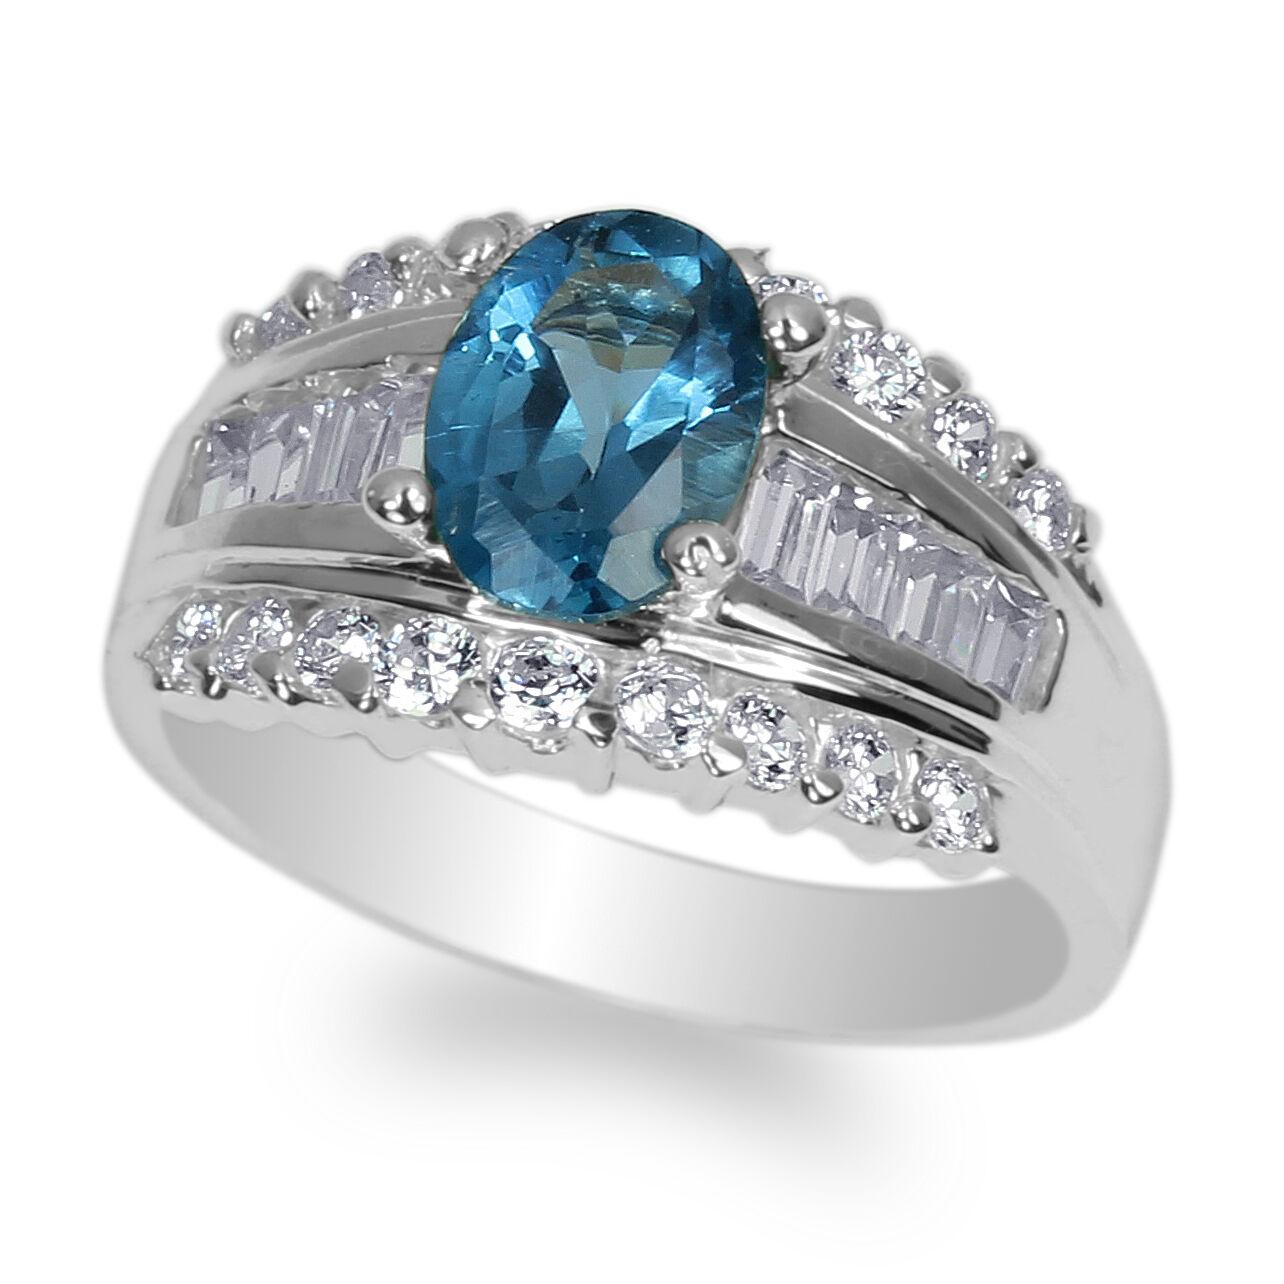 14K White gold 1.25ct Oval bluee Topaz Cubic Zirconia Fancy Ring Size 4-9